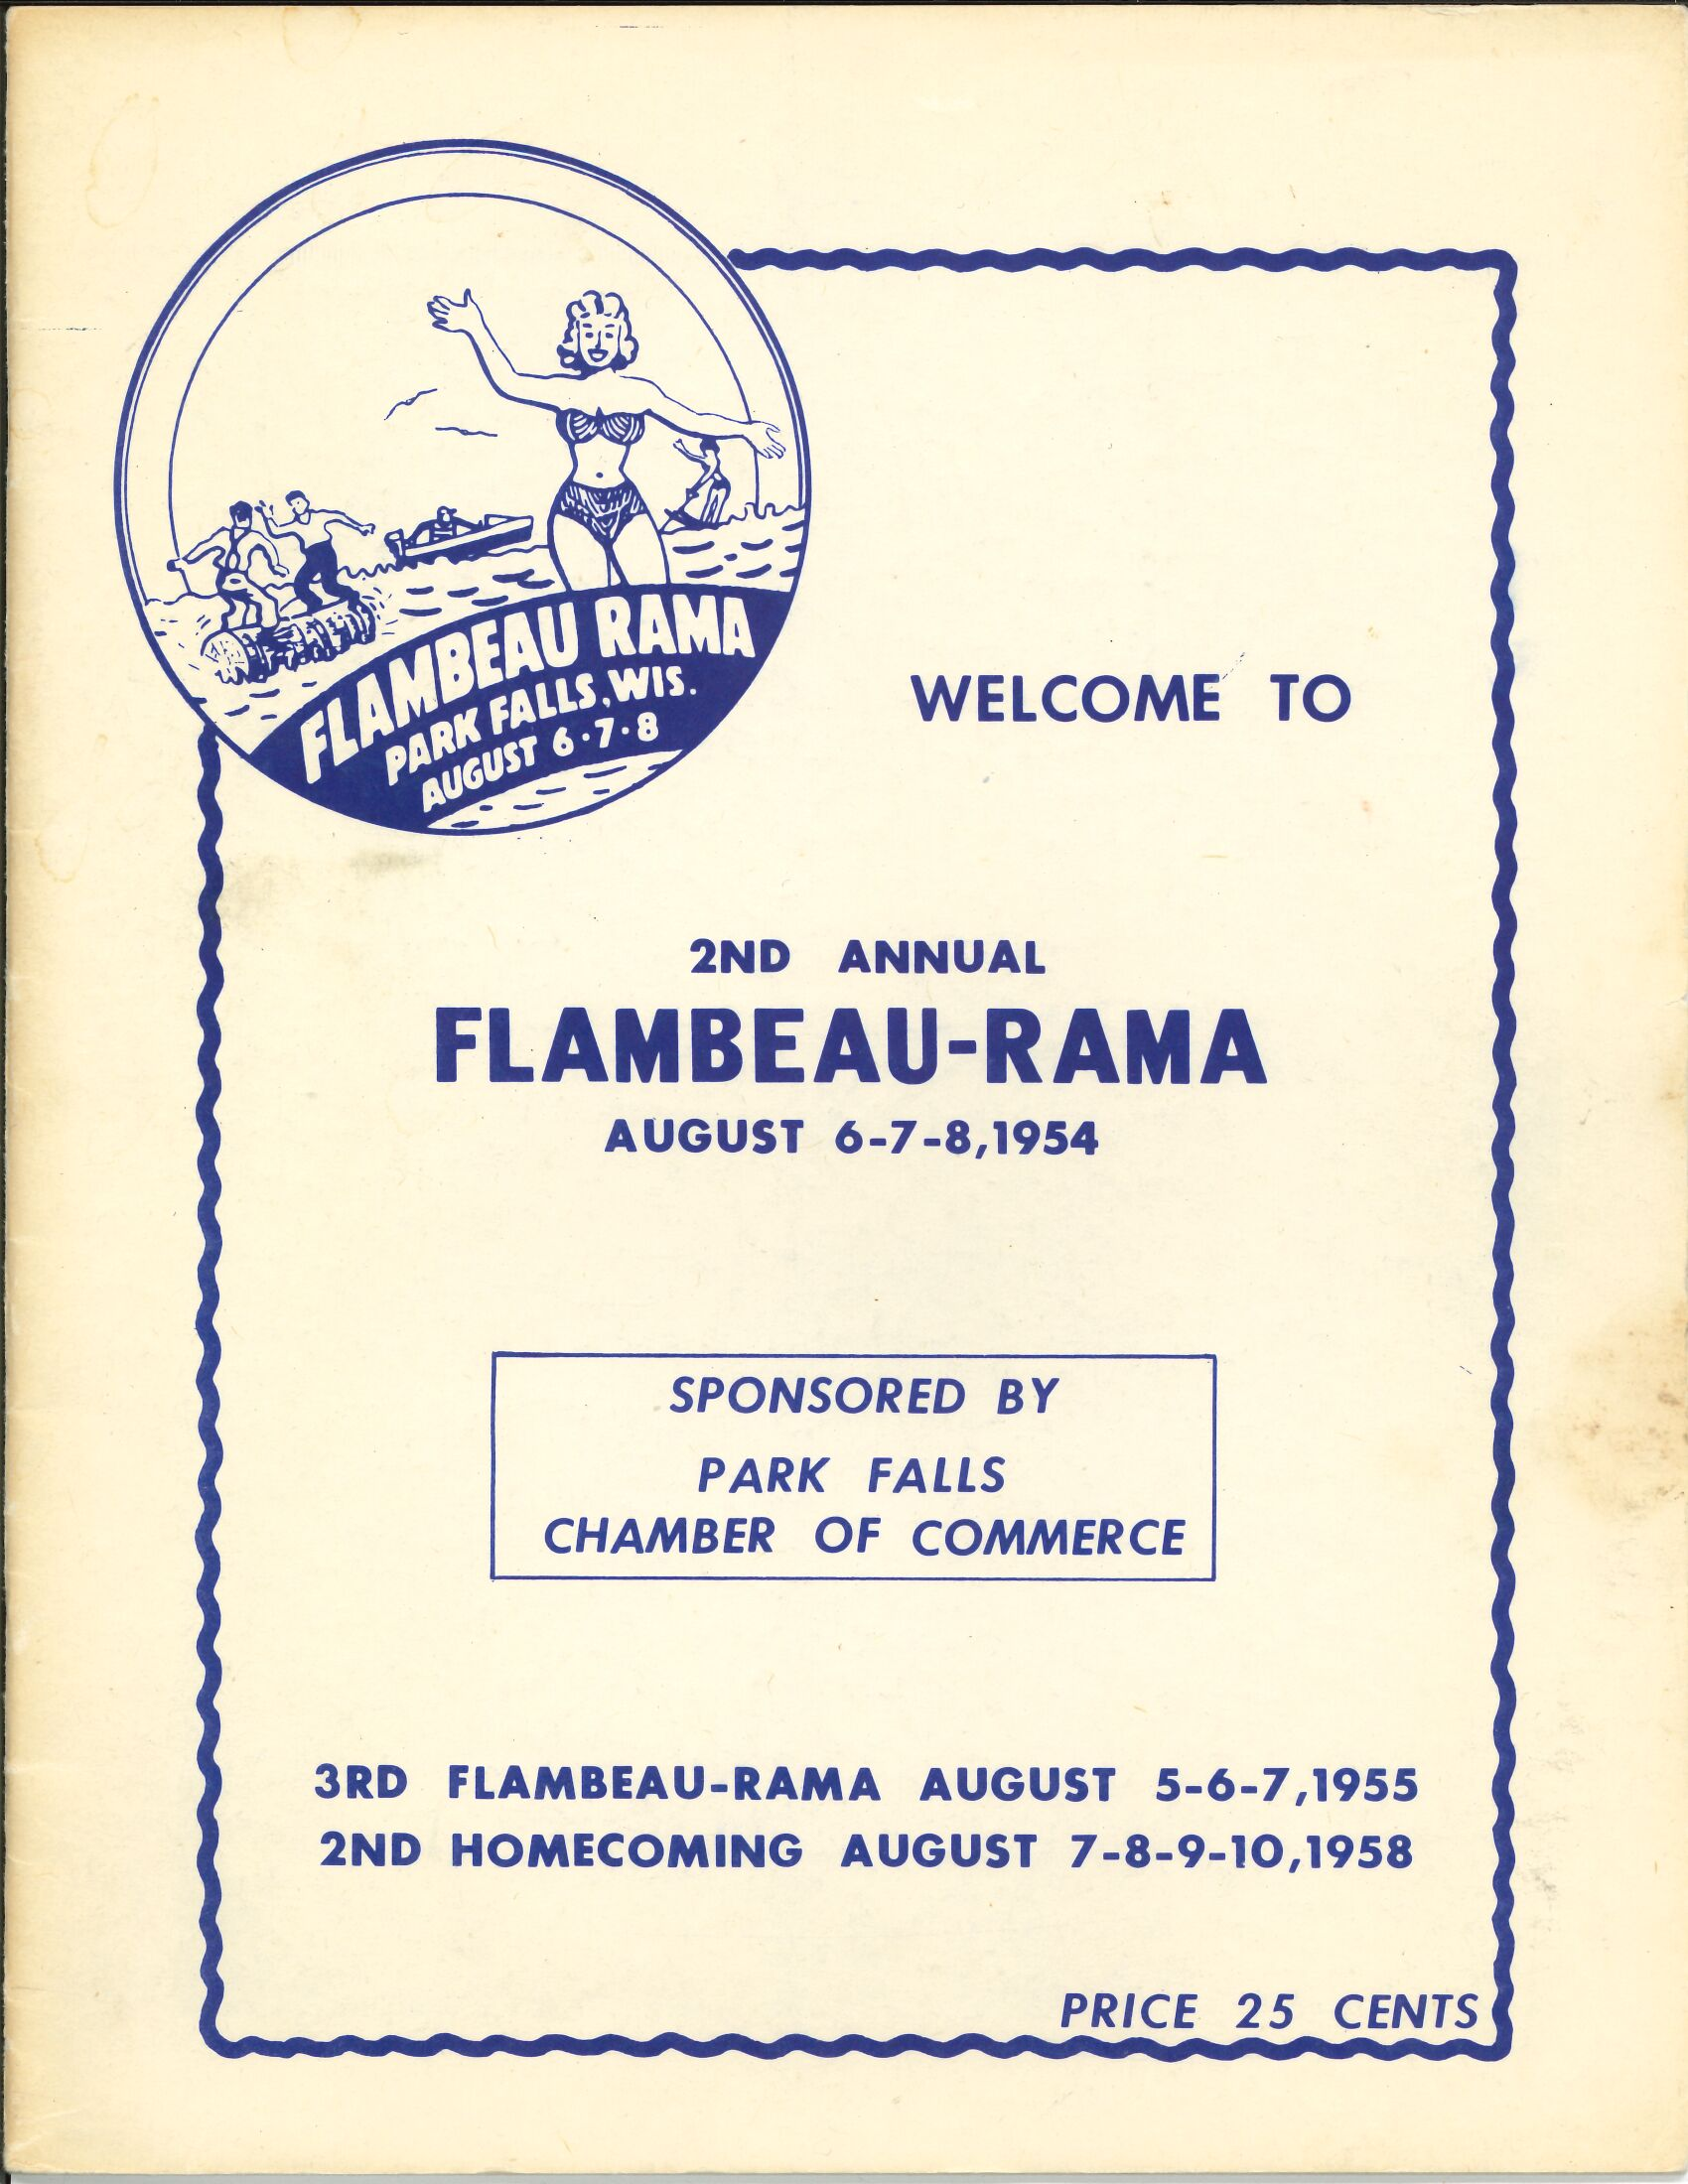 2nd Annual Flambeau Rama Guide 1958